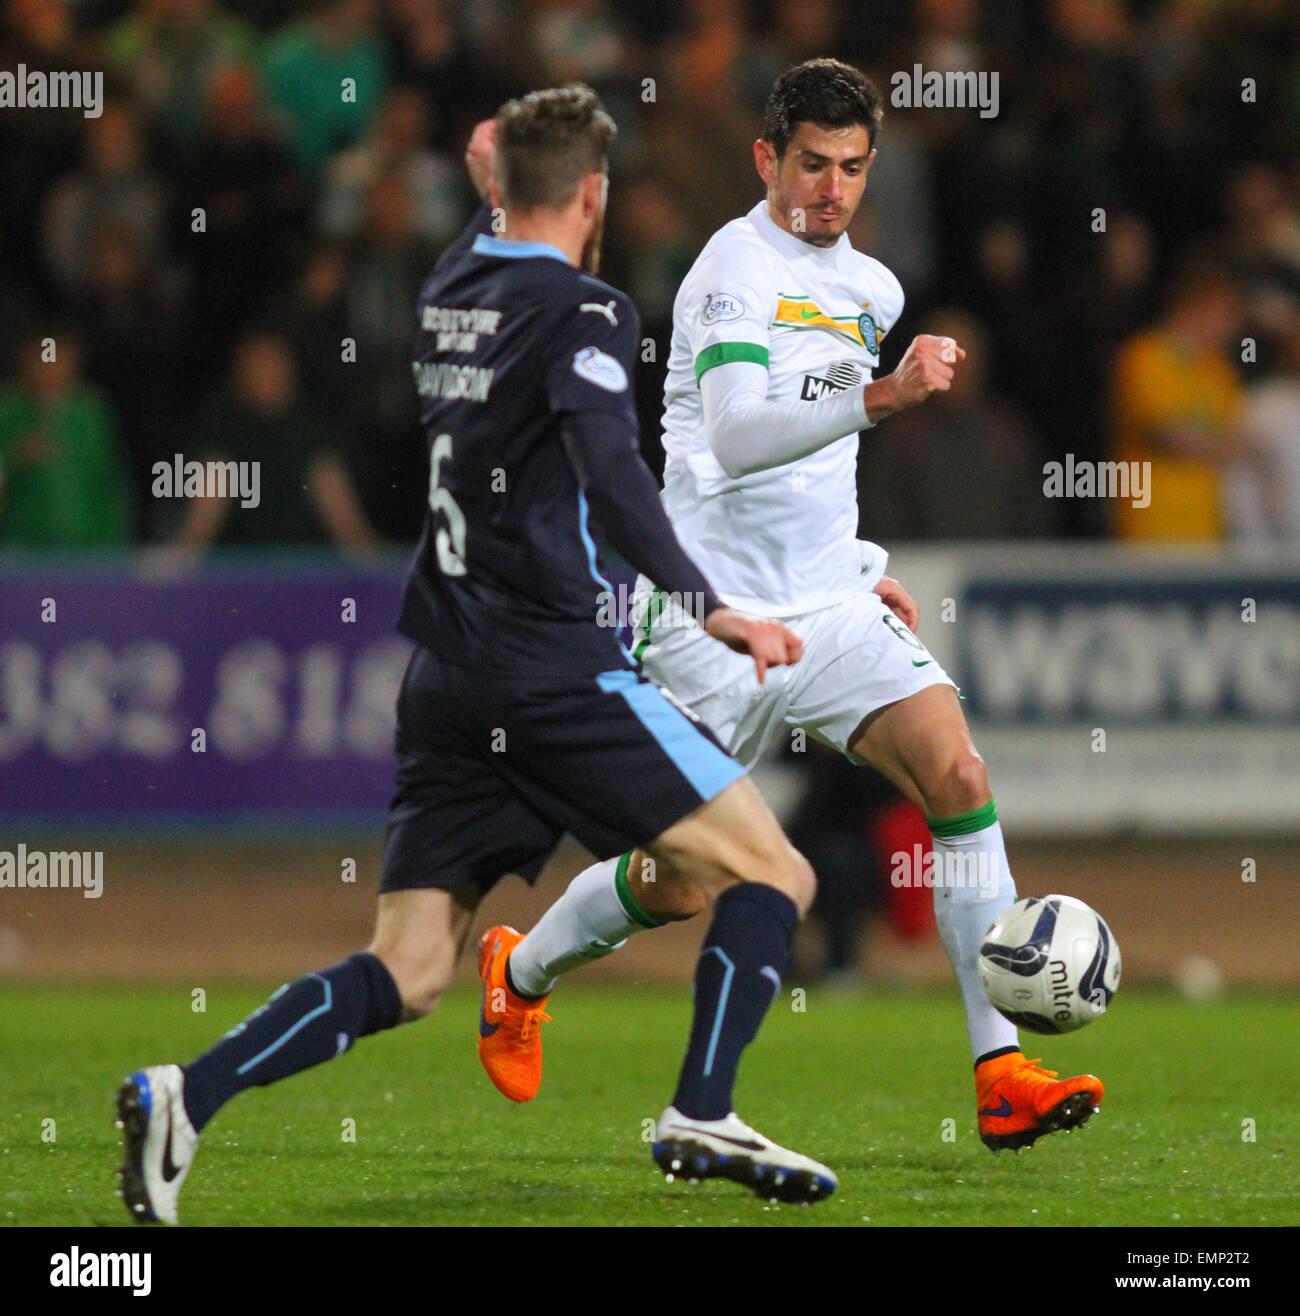 Dundee, Scotland. 22nd Apr, 2015. Scottish Premiership. Dundee versus Celtic. Nir Bitton and Iain Davidson Credit: - Stock Image